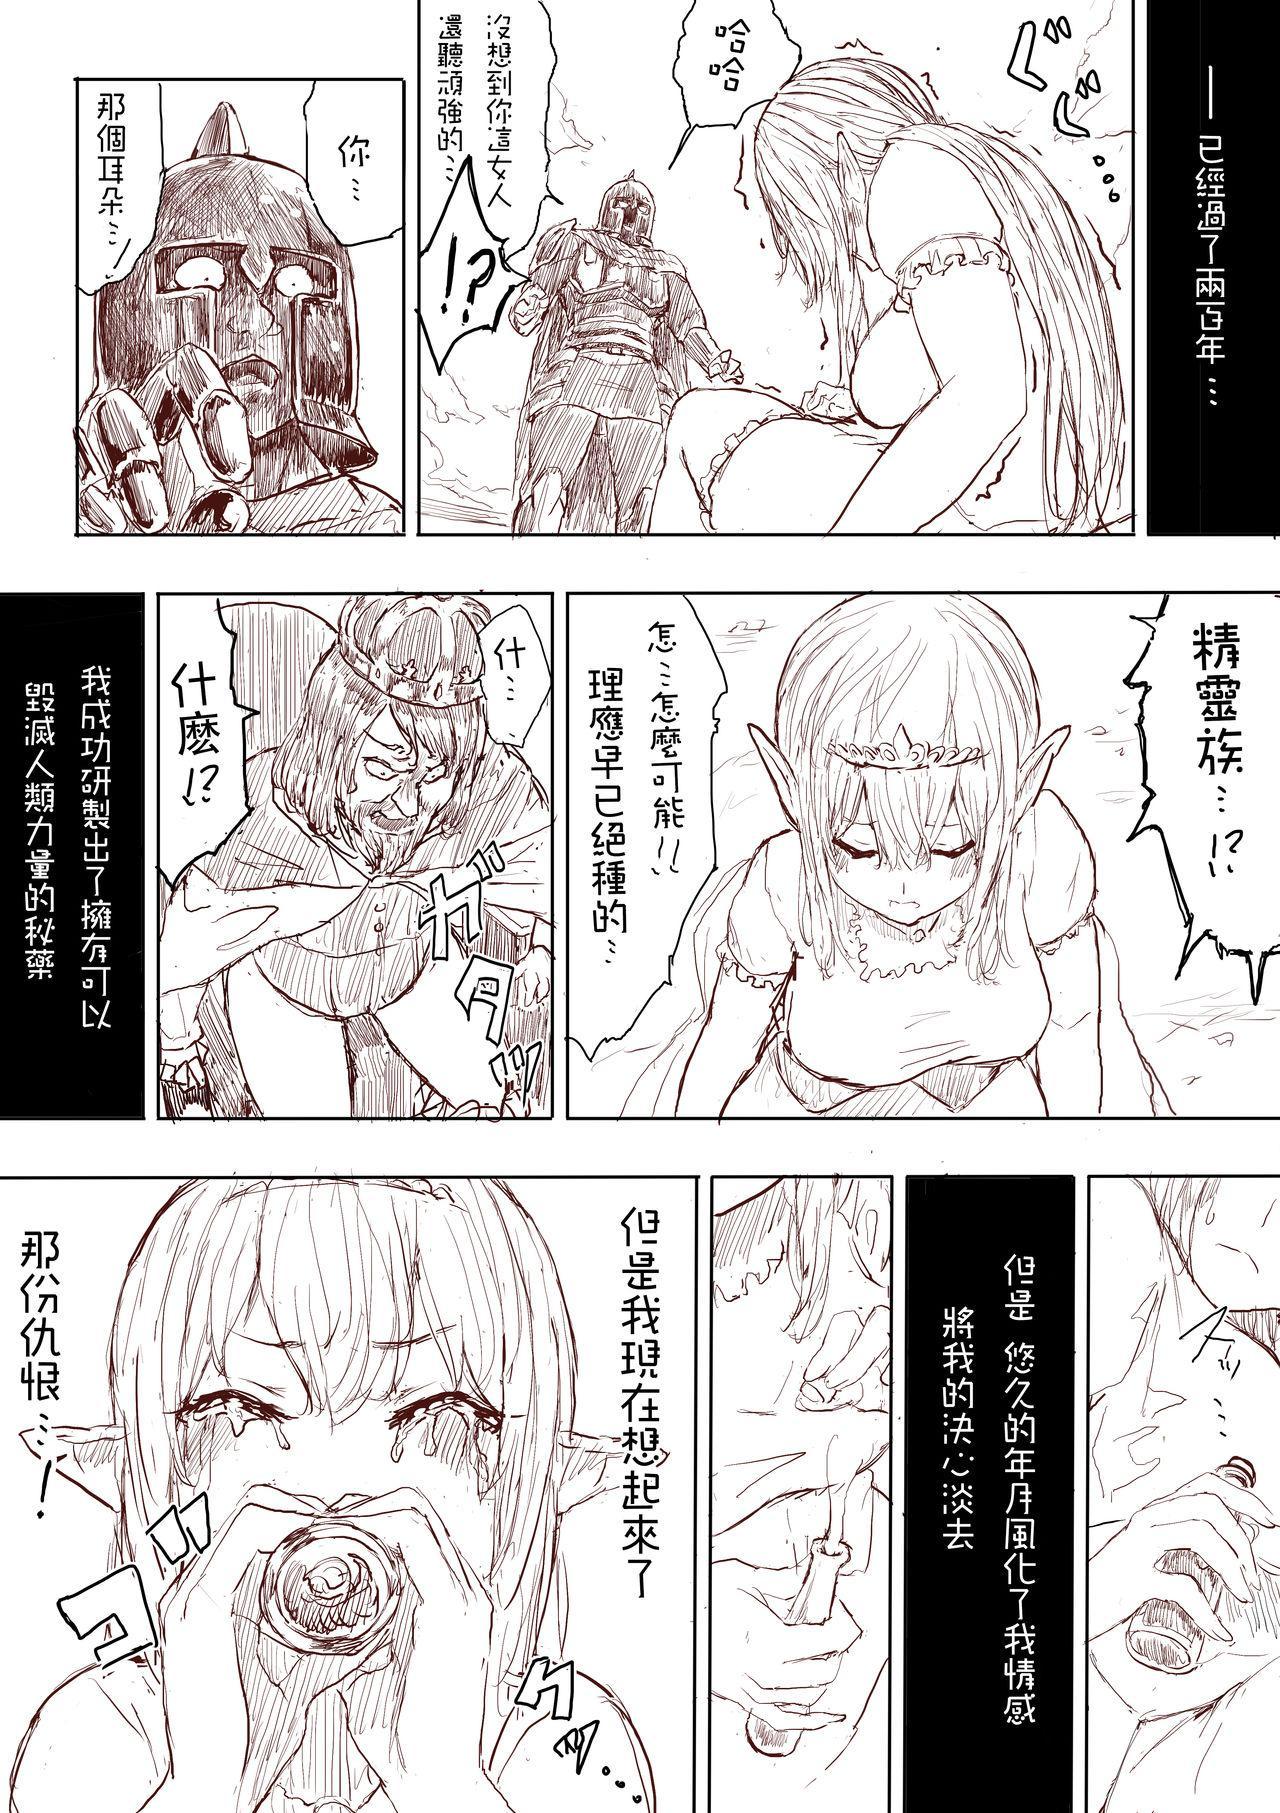 Elf Princess Strikes Back 12